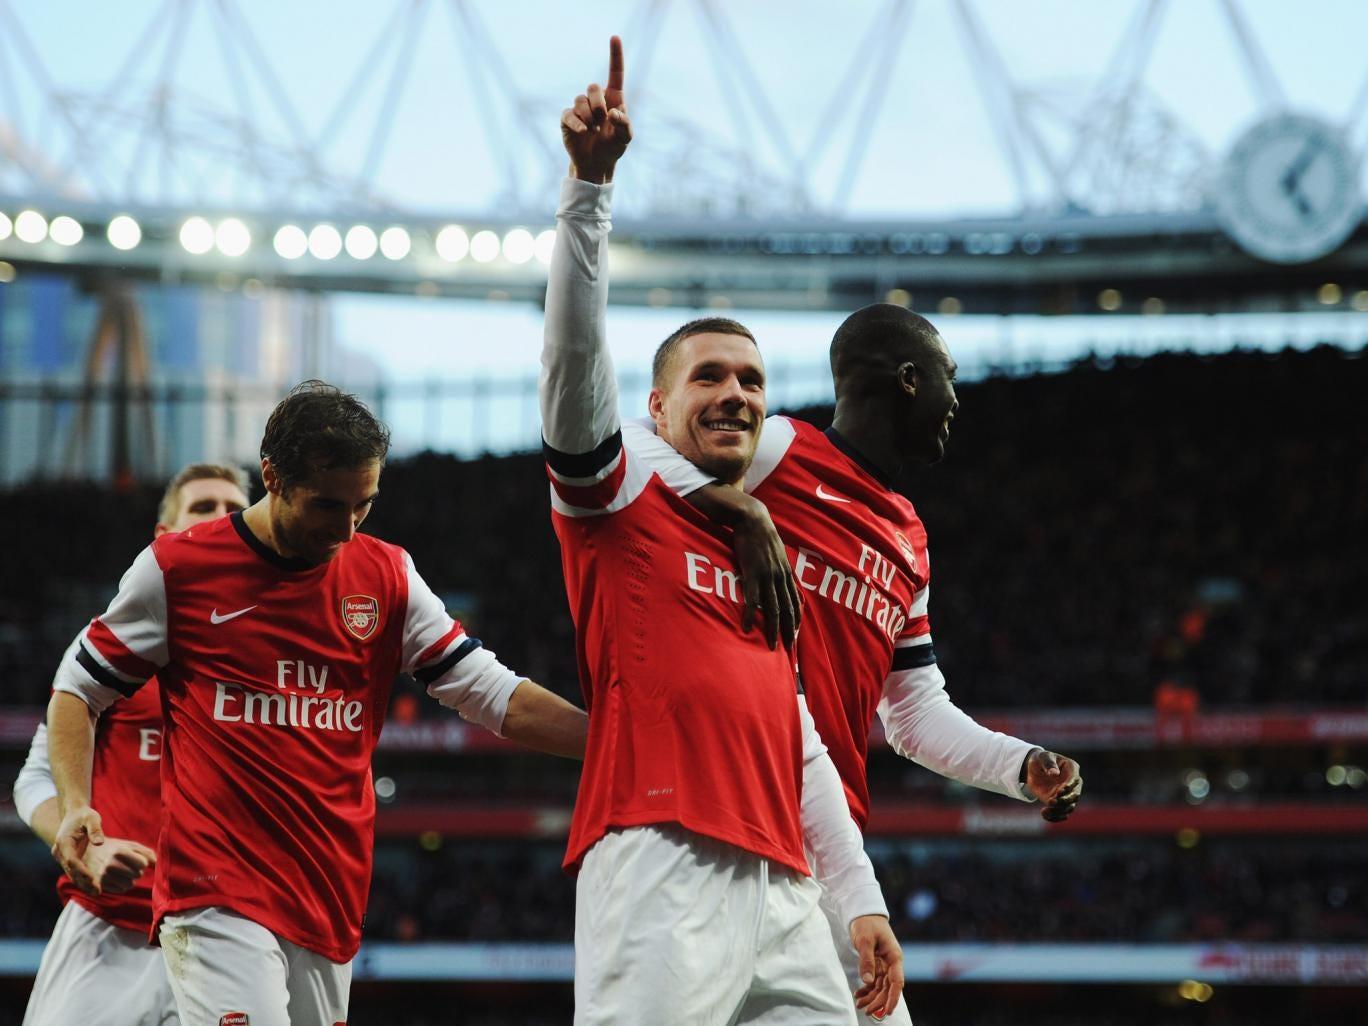 Luka Podolski celebrates after putting Arsenal 2-0 ahead against Liverpool